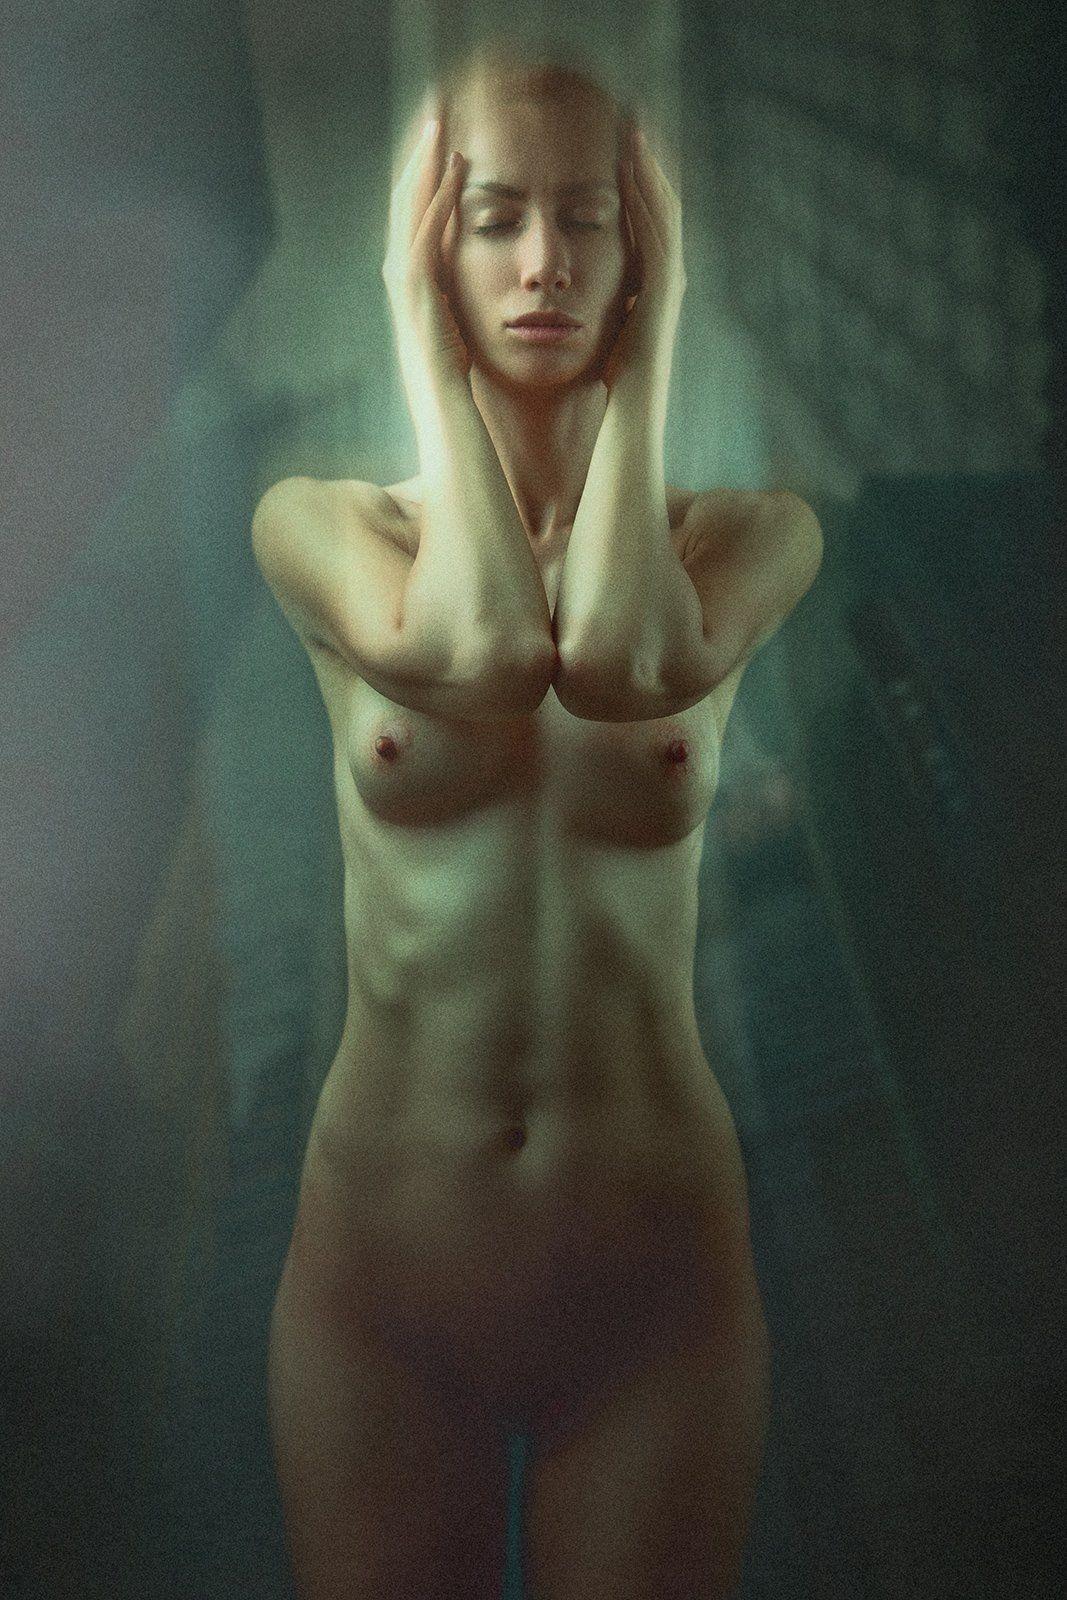 nude, female, art, portrait, photo, manipulation, nudes, naked, stress, destruction, naked, woman, adult, head, body, beauty, city, urban, life, Дмитрий Толоконов